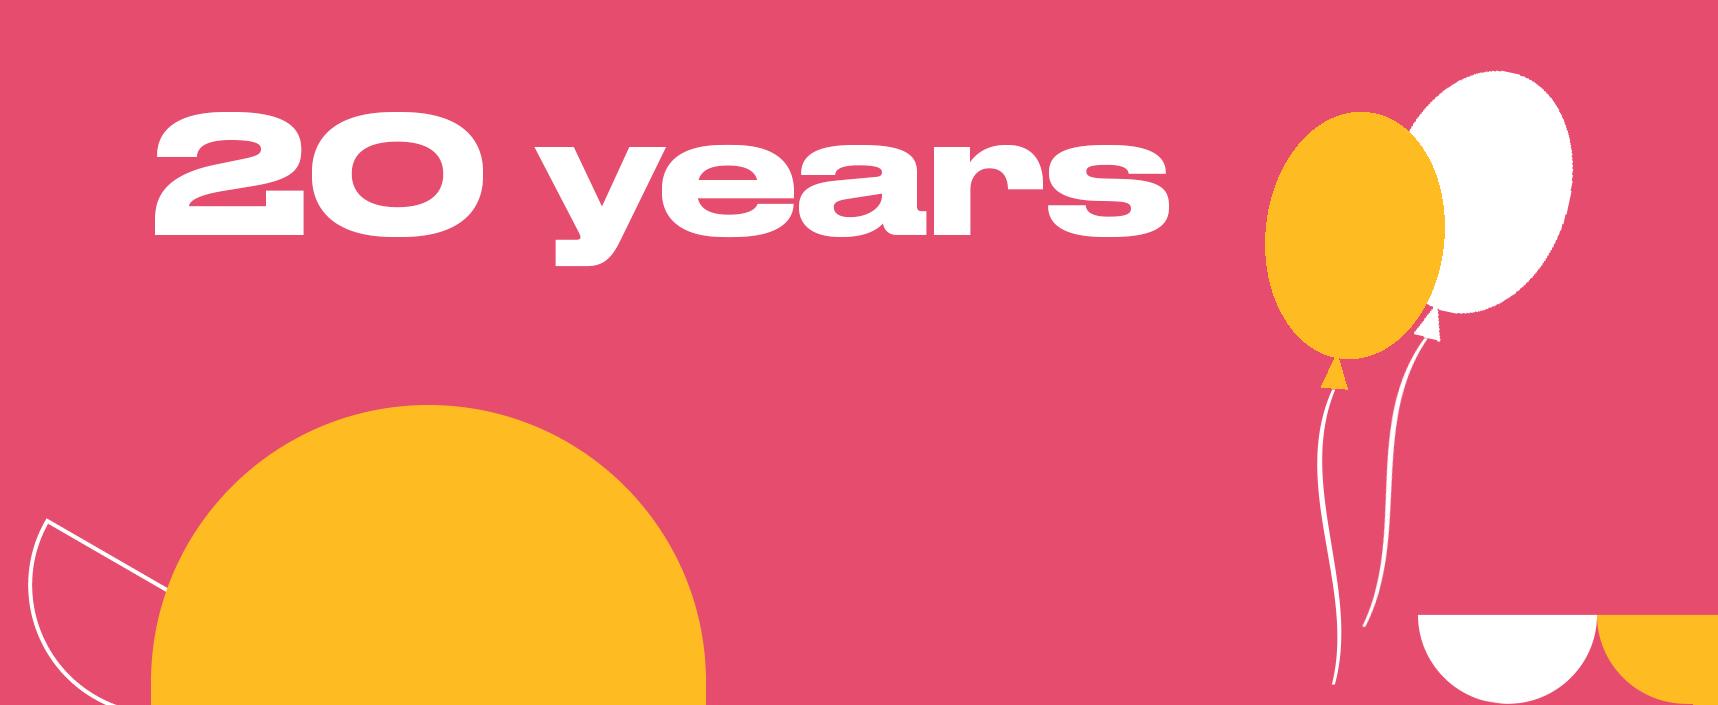 IG 20 years birthday